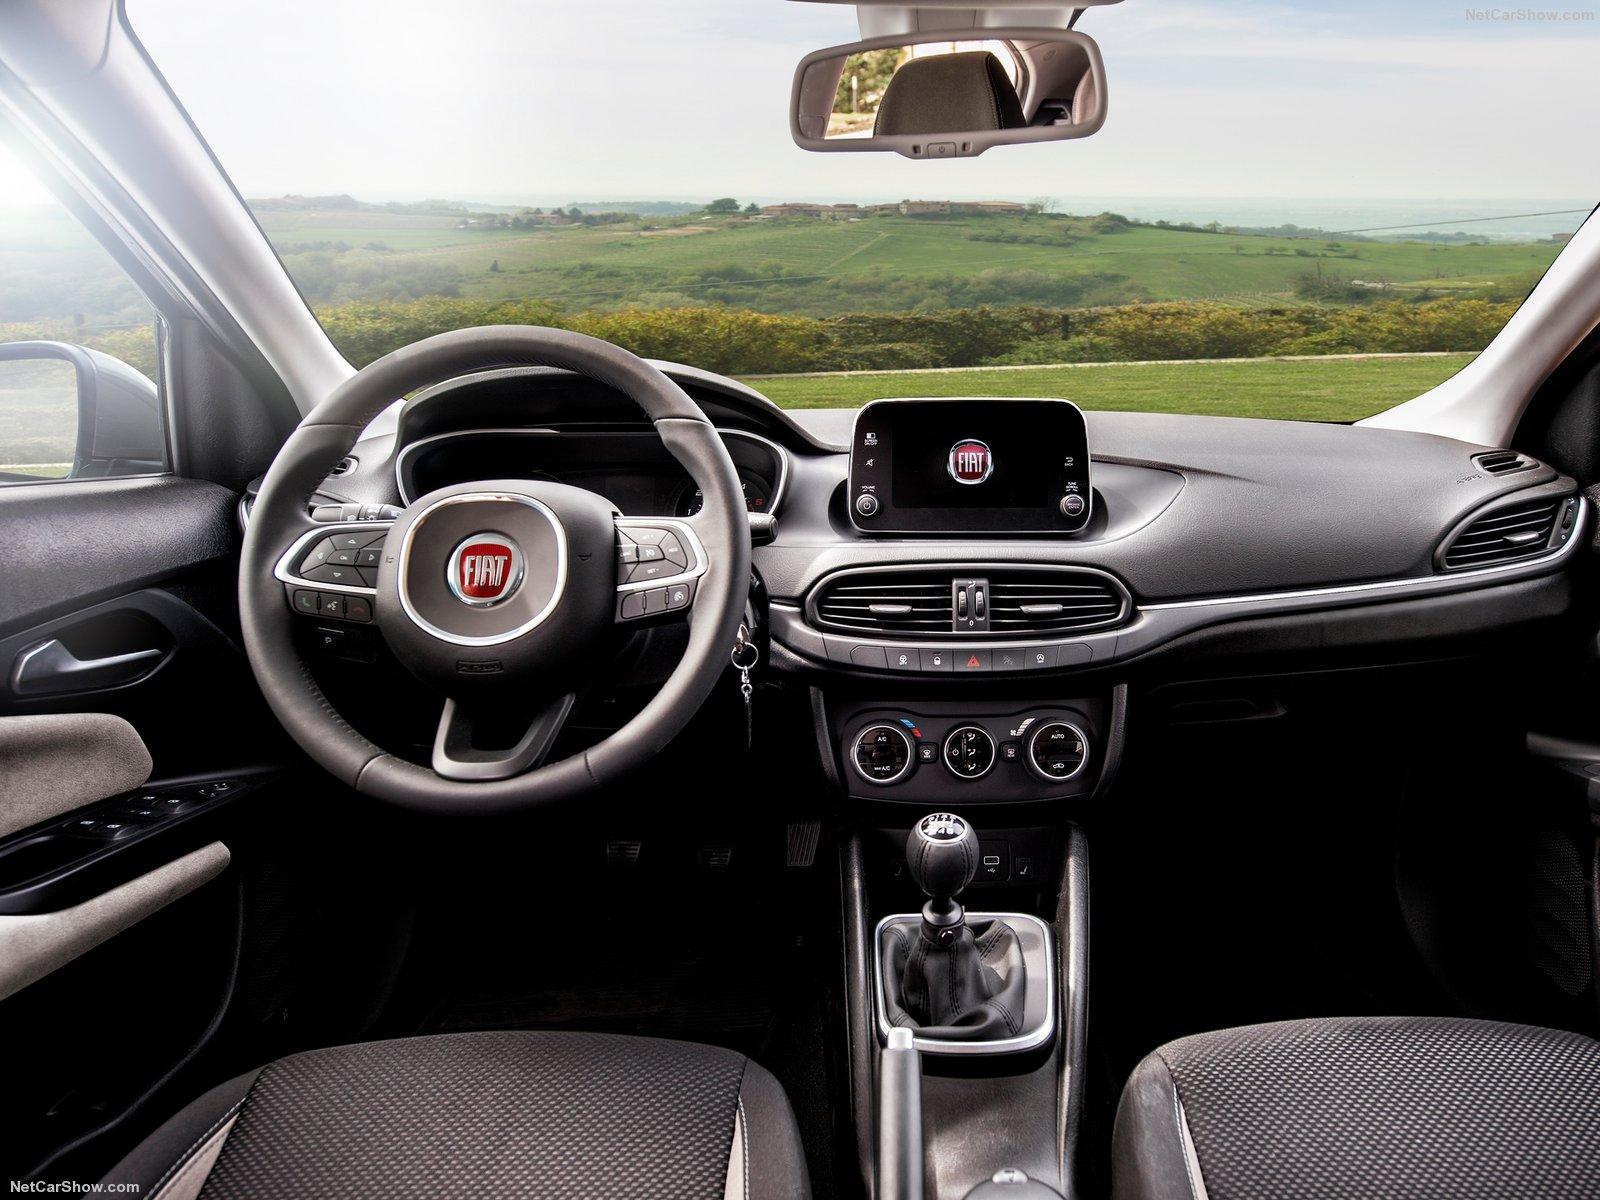 Fiat Tipo Interior - Leather